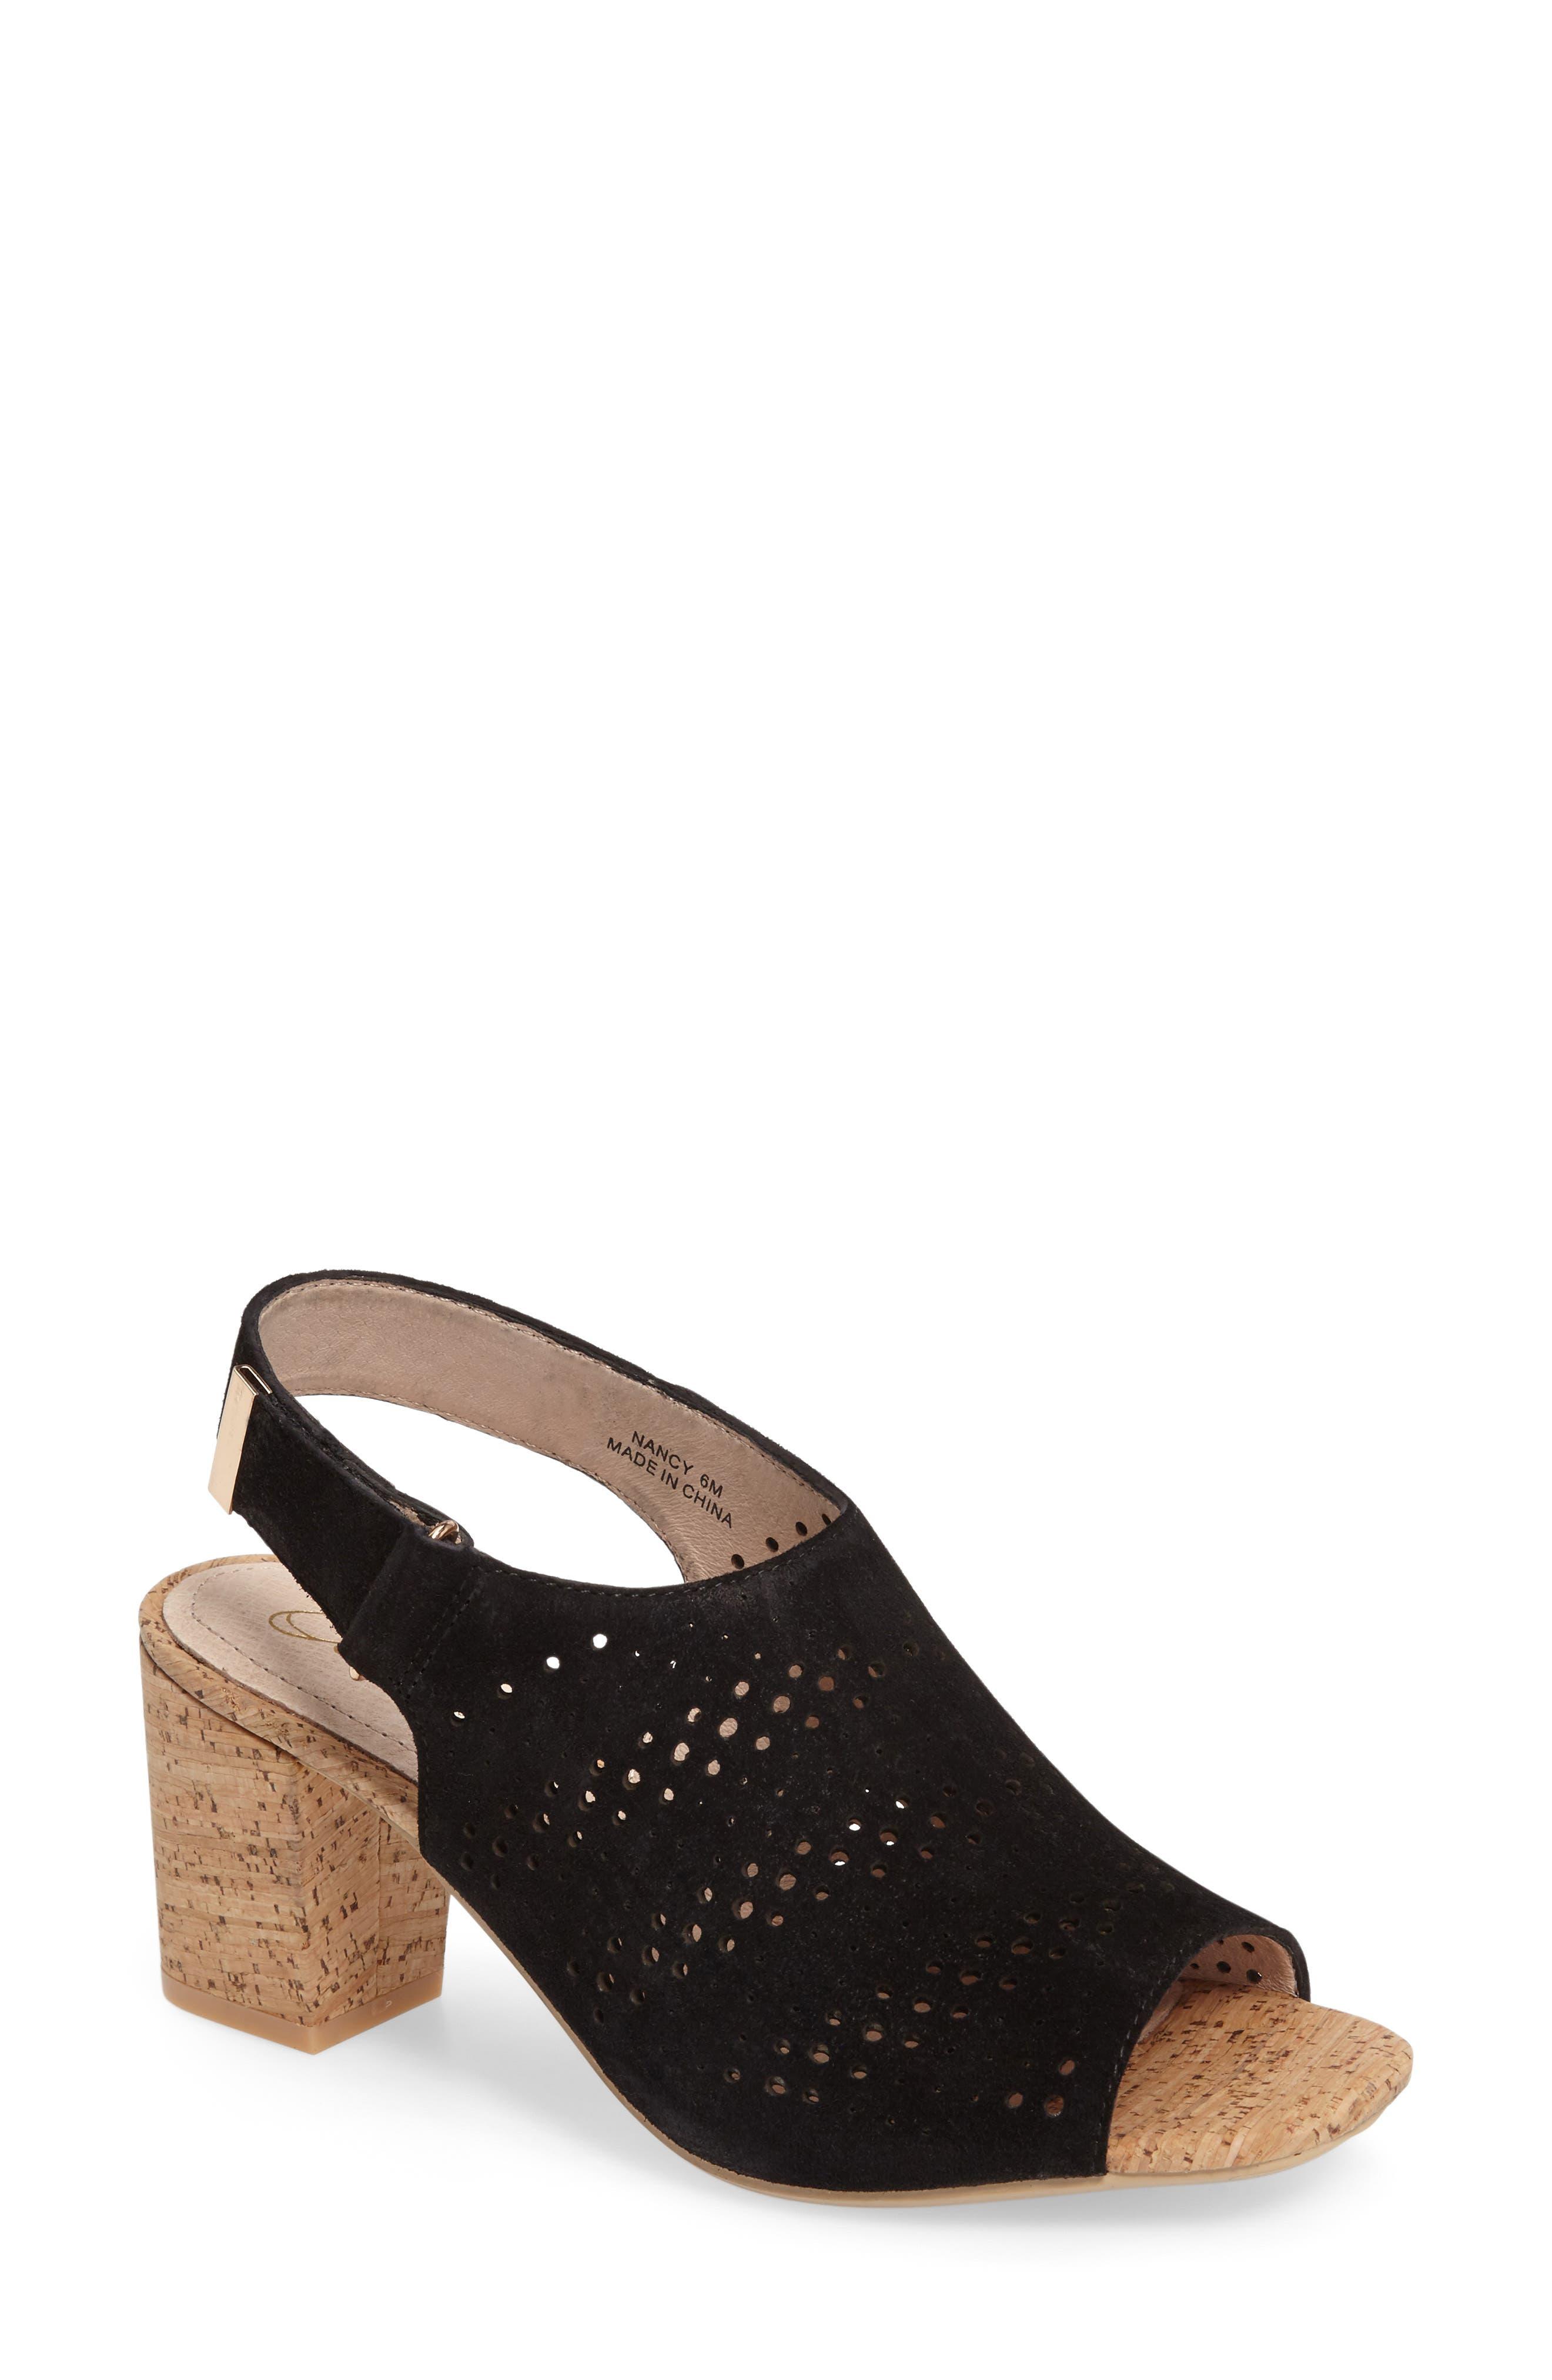 Alternate Image 1 Selected - Sudini Nancy Perforated Sandal (Women)